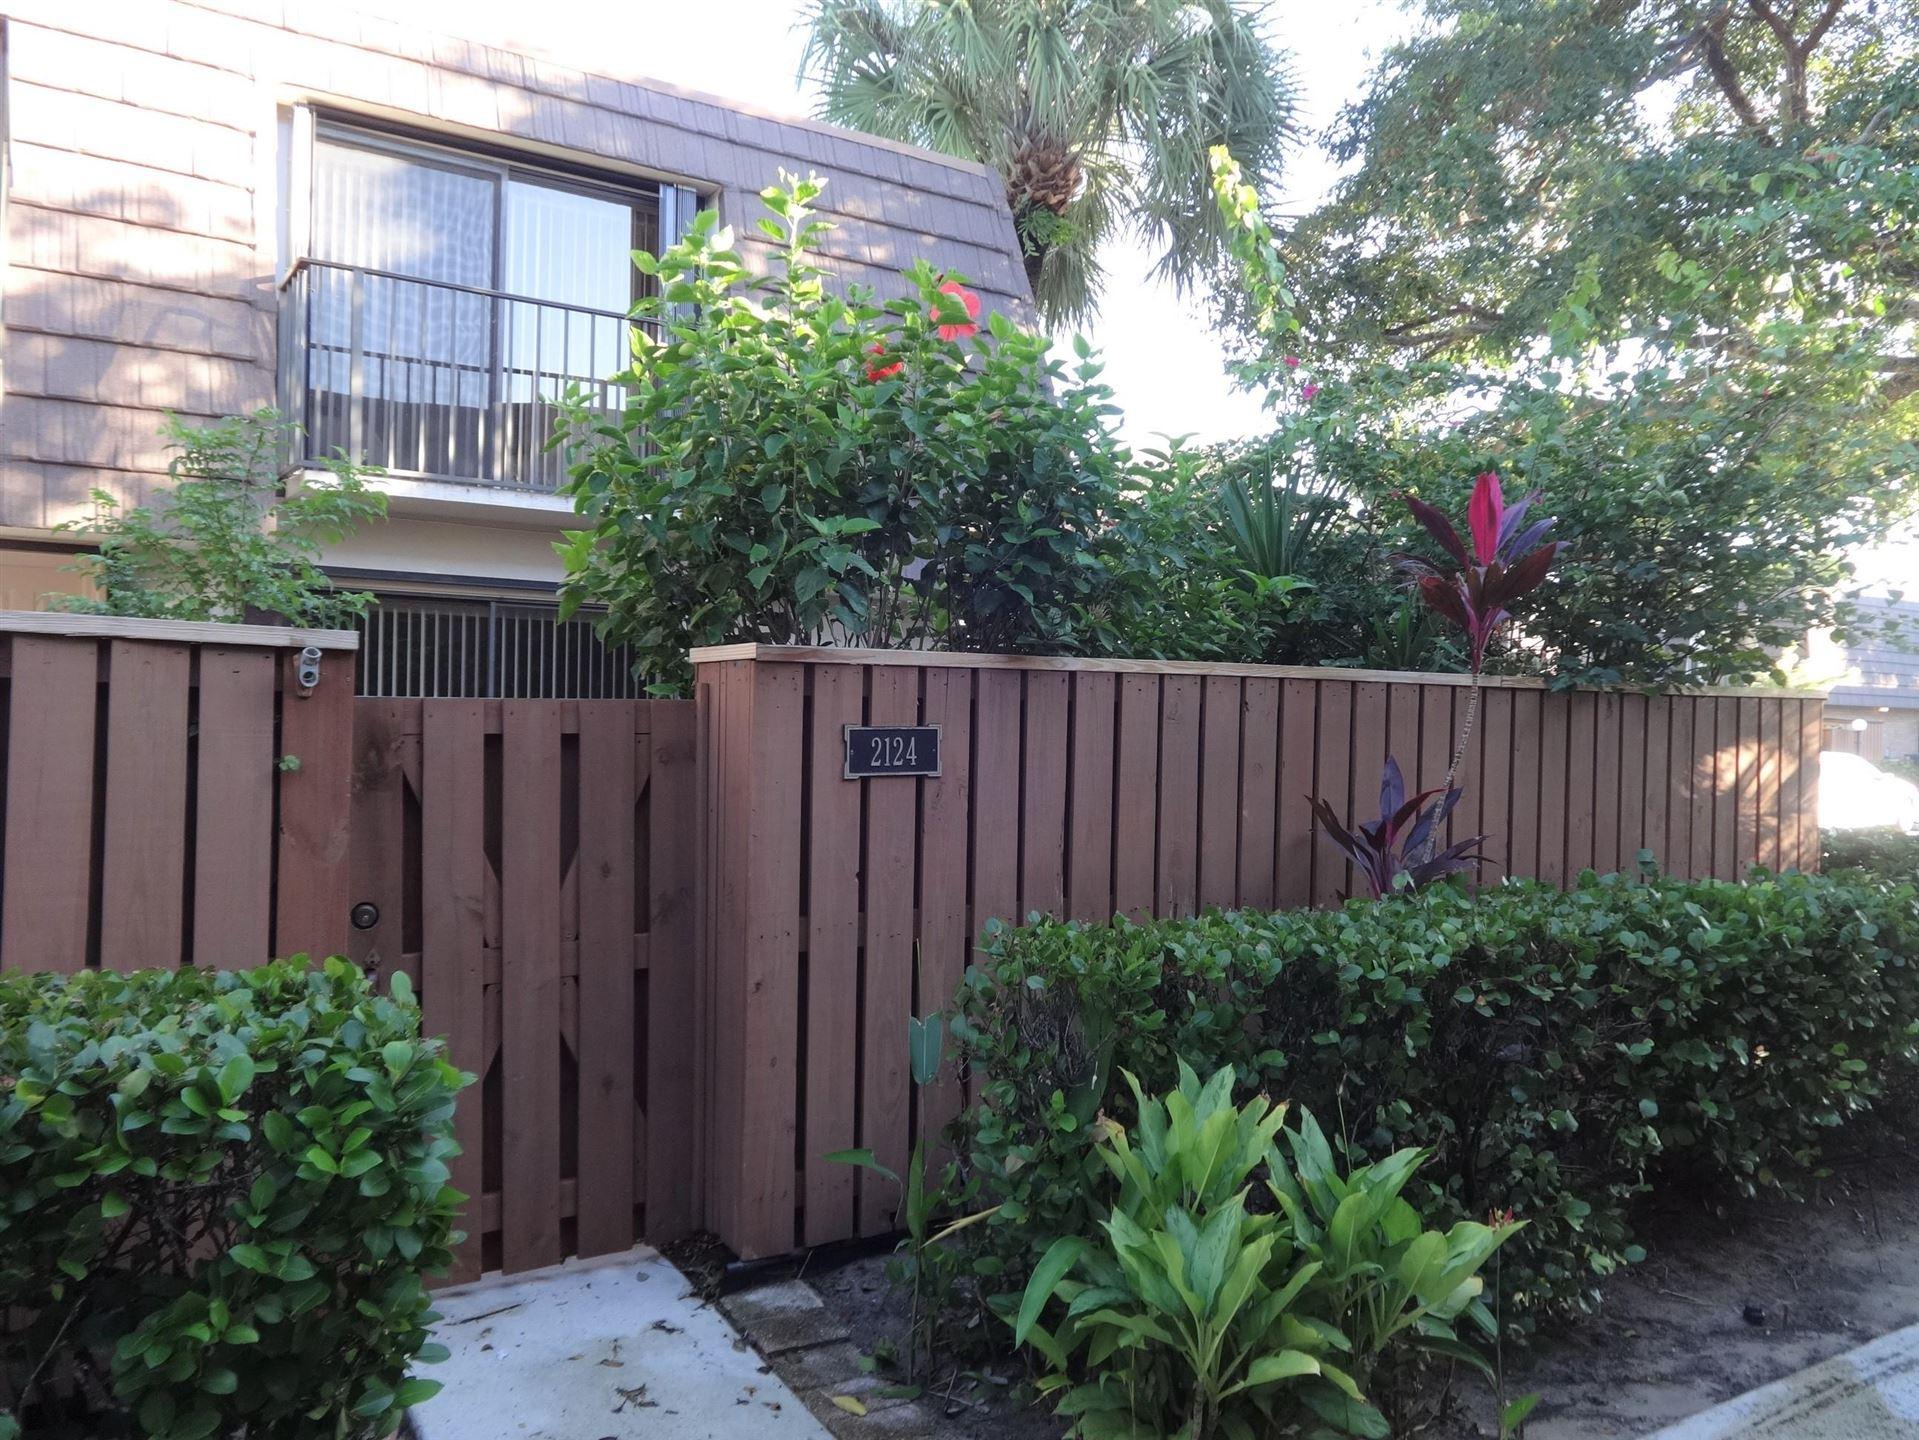 Photo of 2124 21st Court, Jupiter, FL 33477 (MLS # RX-10671347)